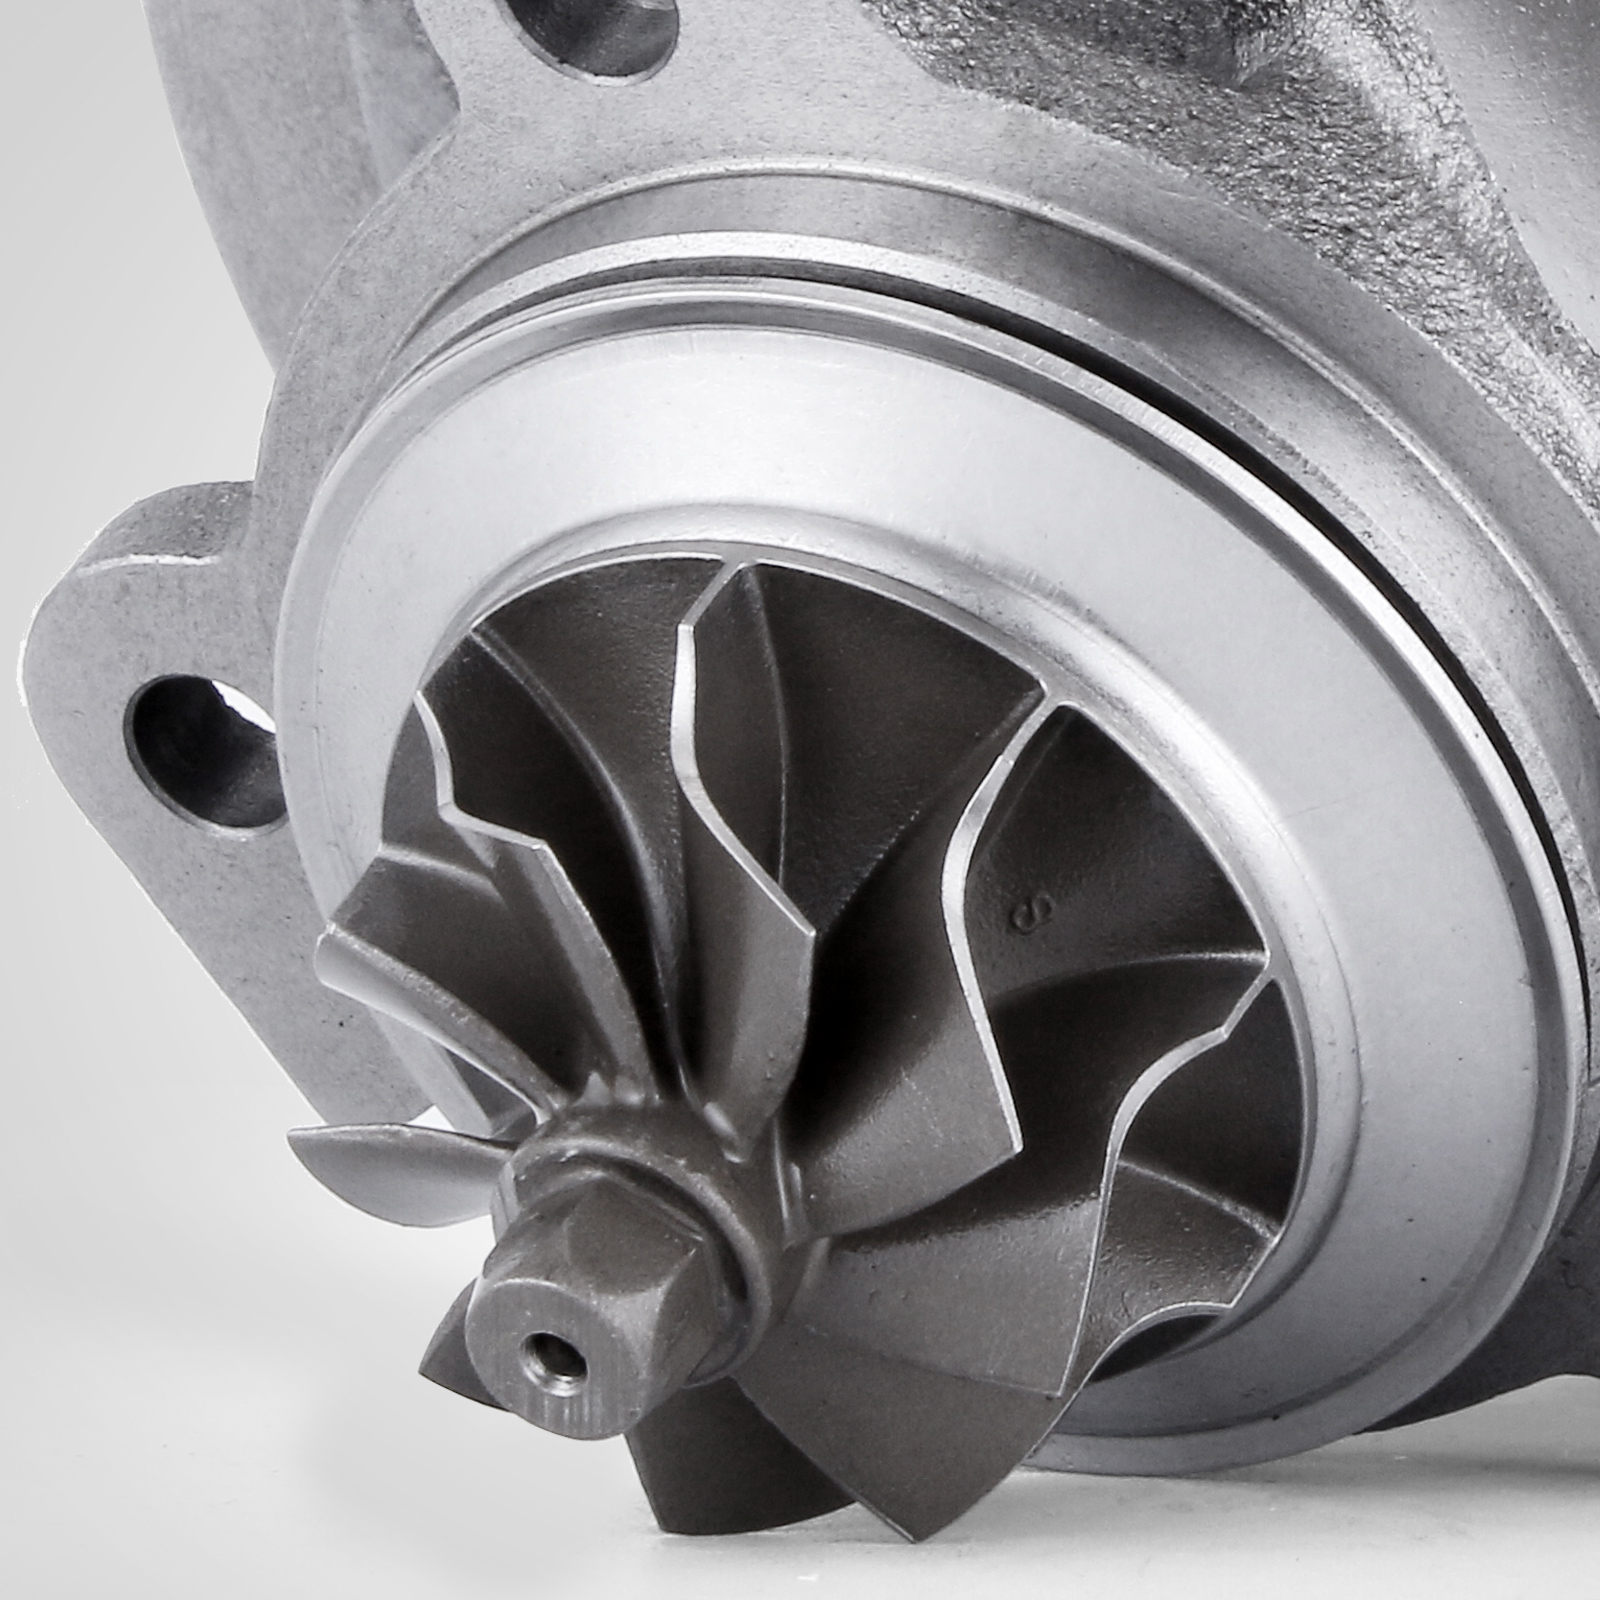 CHRA KP35 Pour Renault Clio Kangoo 1.5 dci 65 CV K9K turbo Cartridge 54359700000